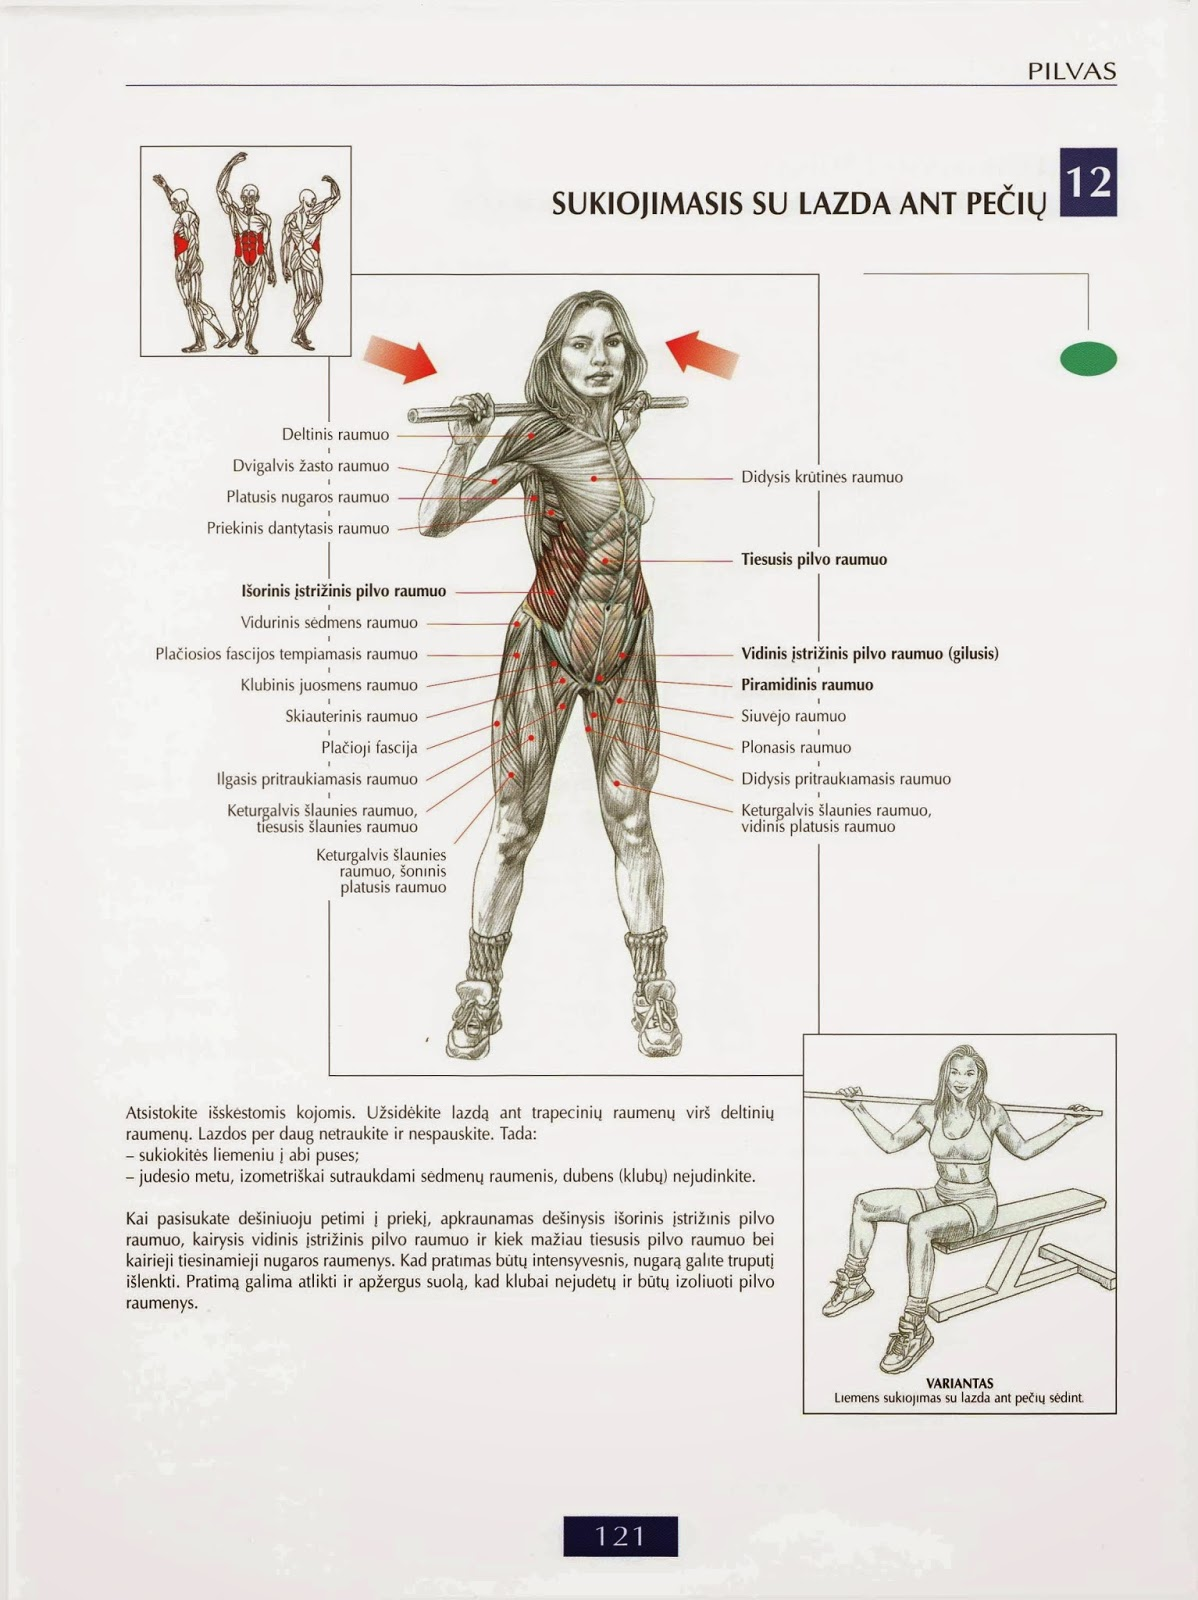 Pilvas | Pratimai raumenims